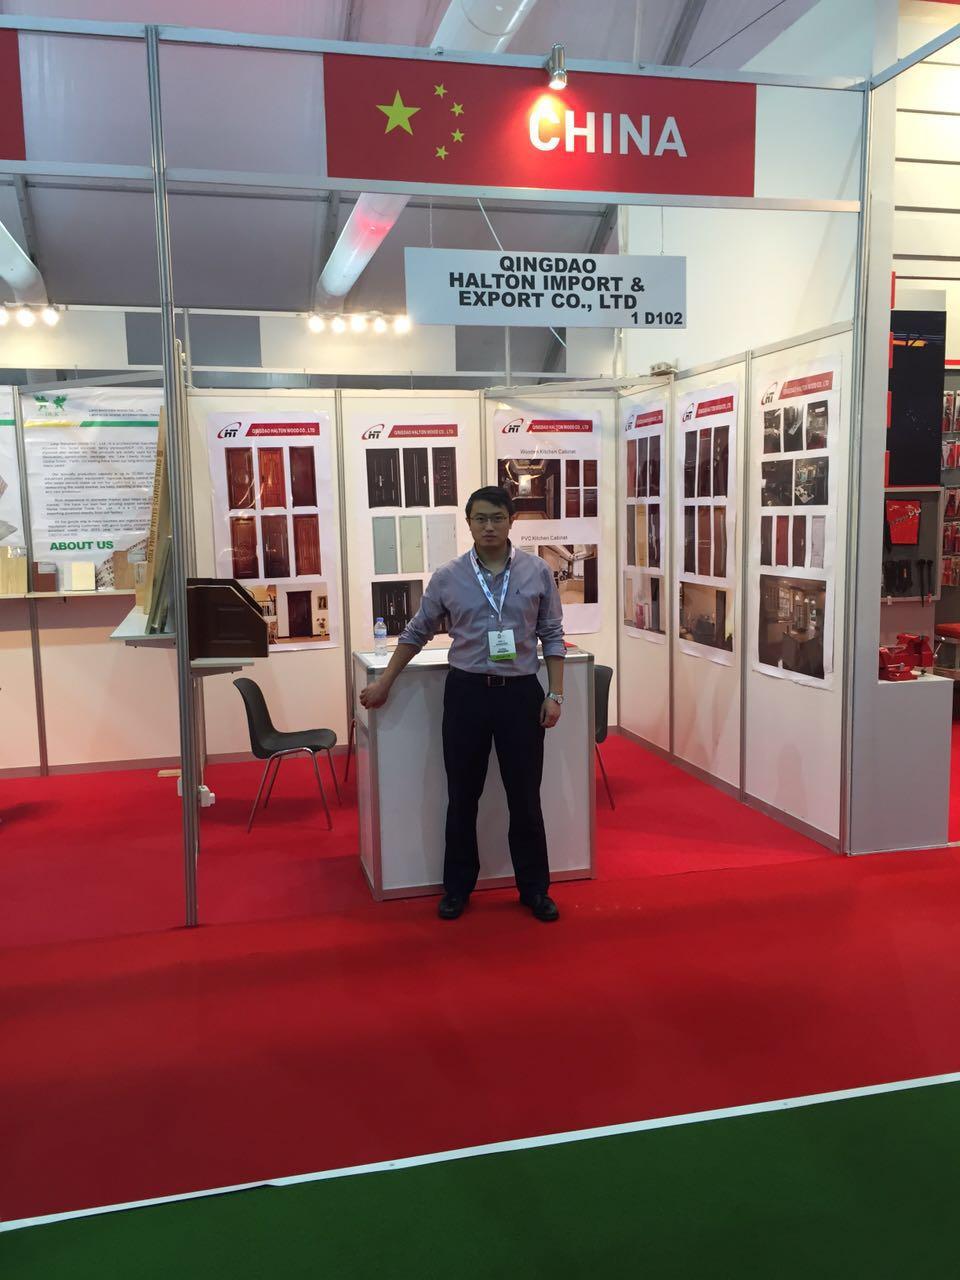 Jeddah International Exhibition of 2017